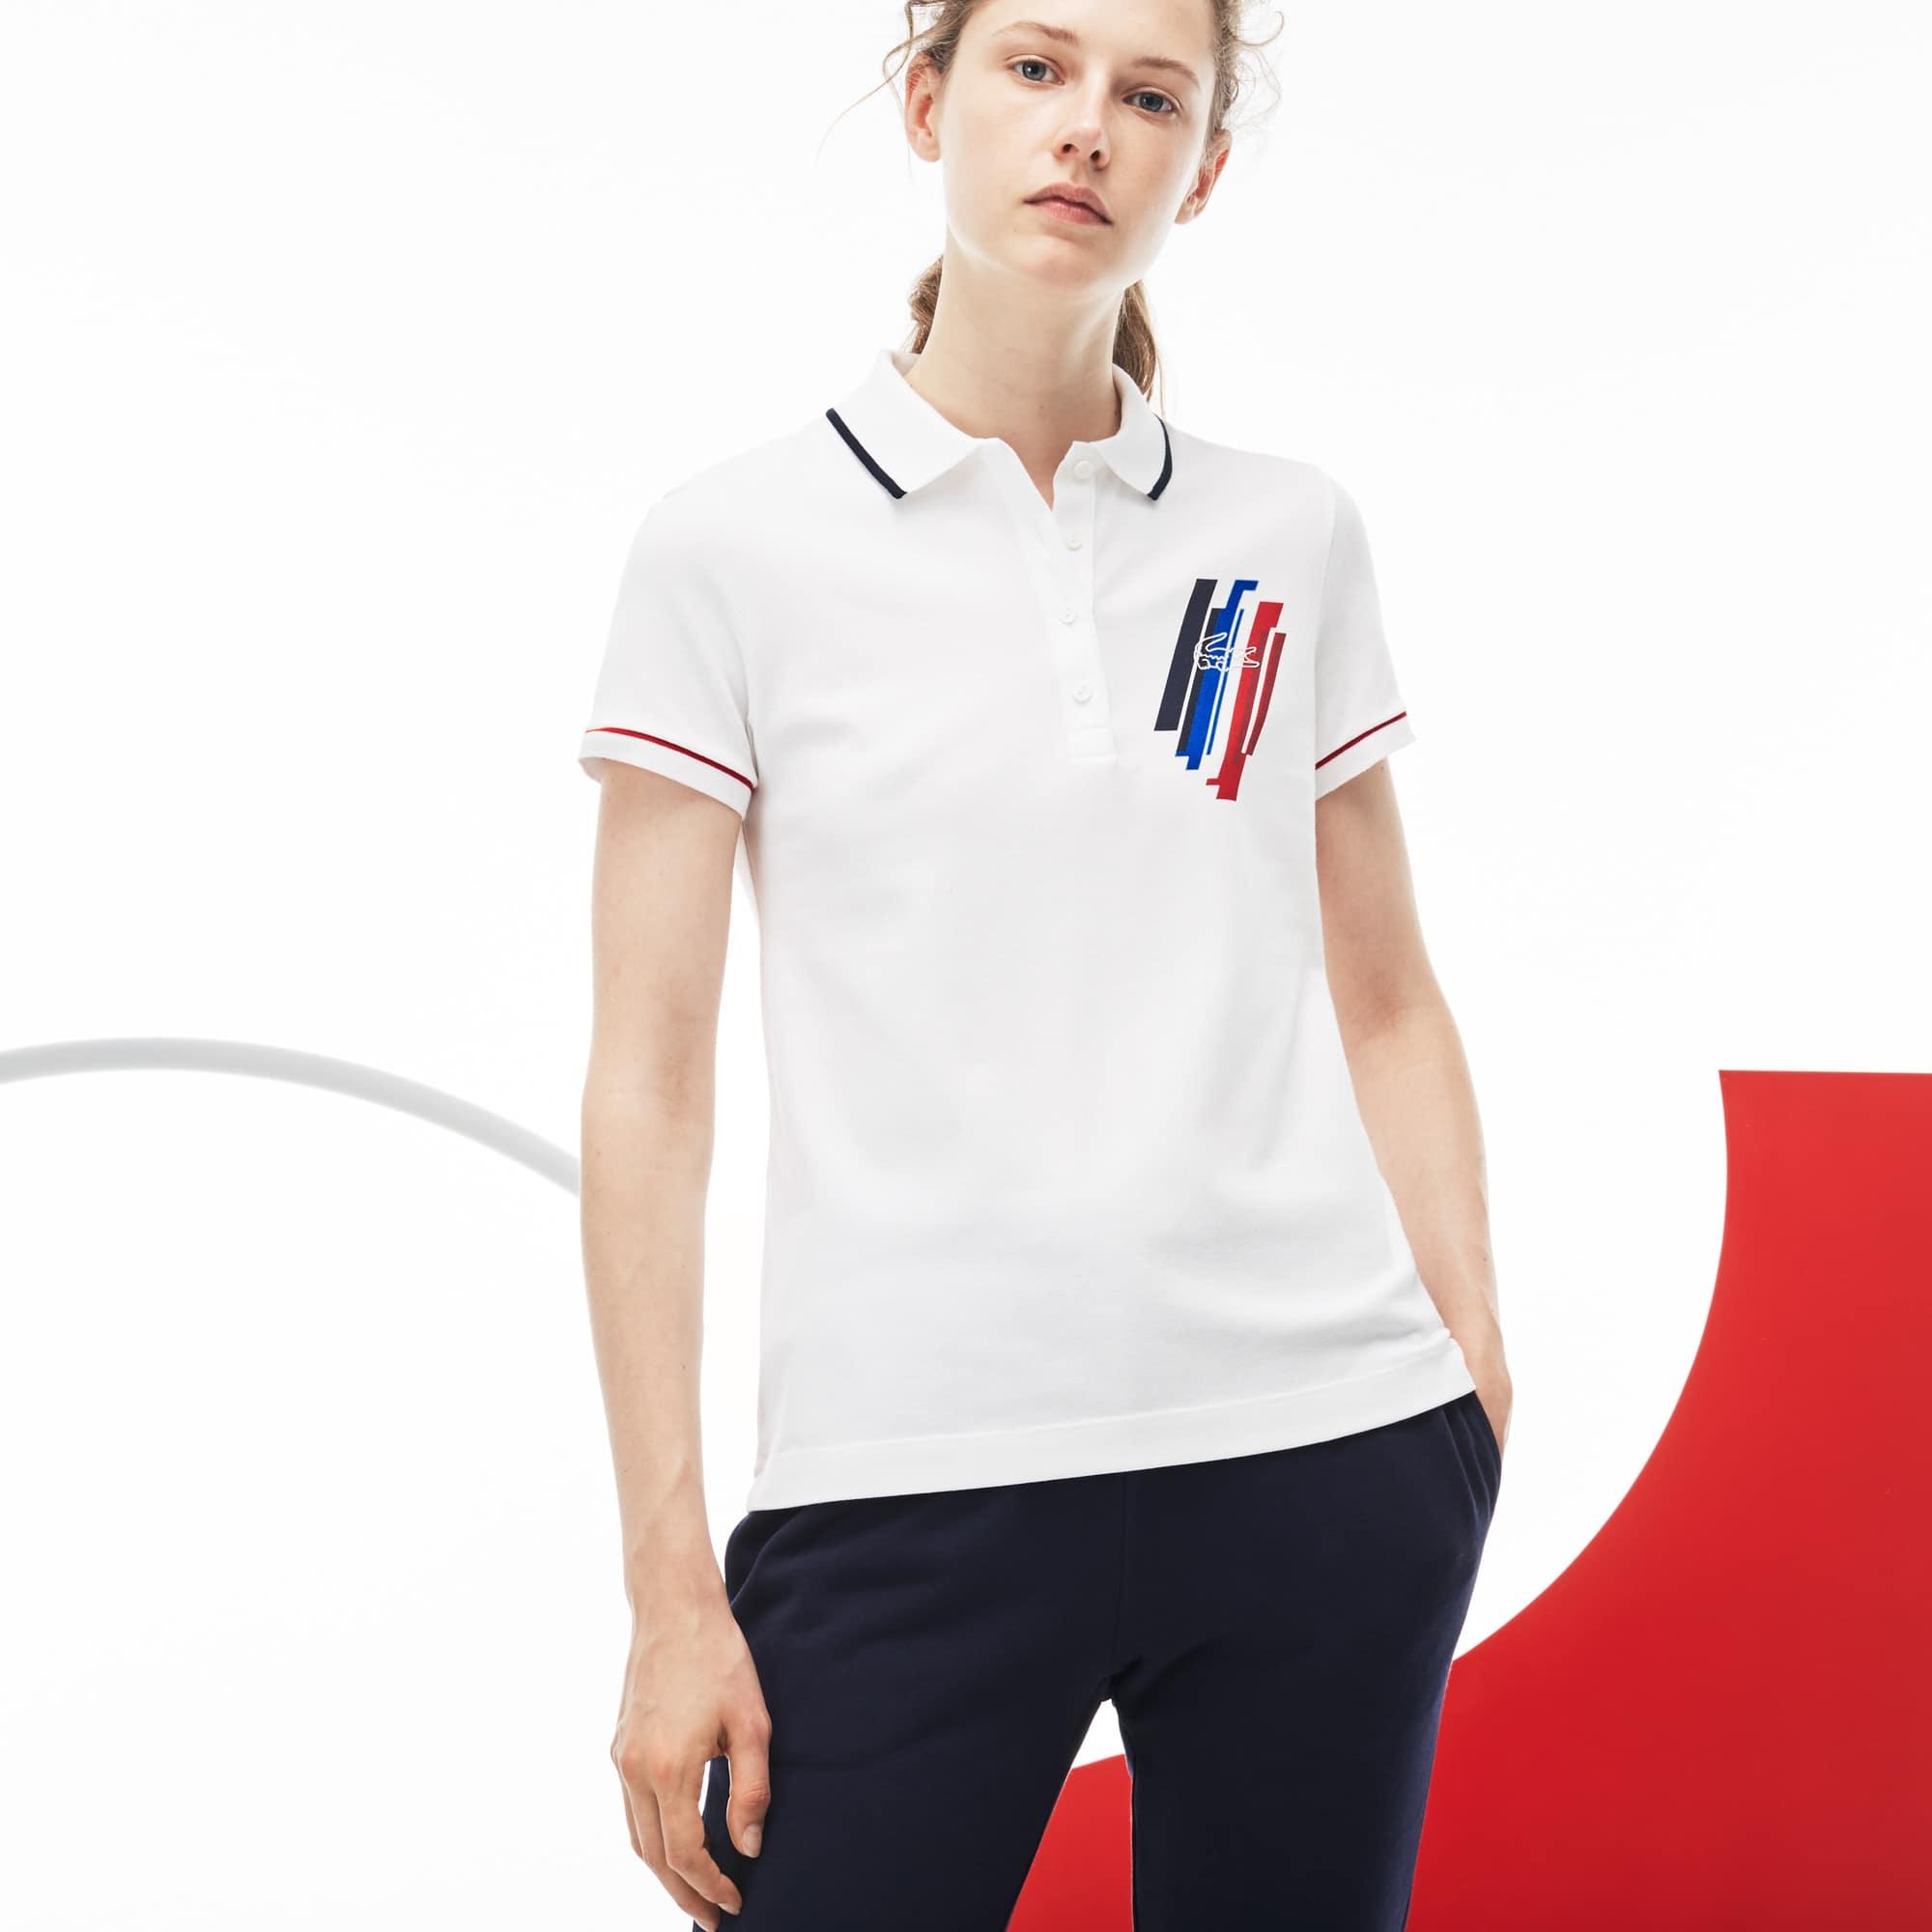 Damen-Polo aus Mini-Piqué LACOSTE SPORT COLLECTION TRICOLORE